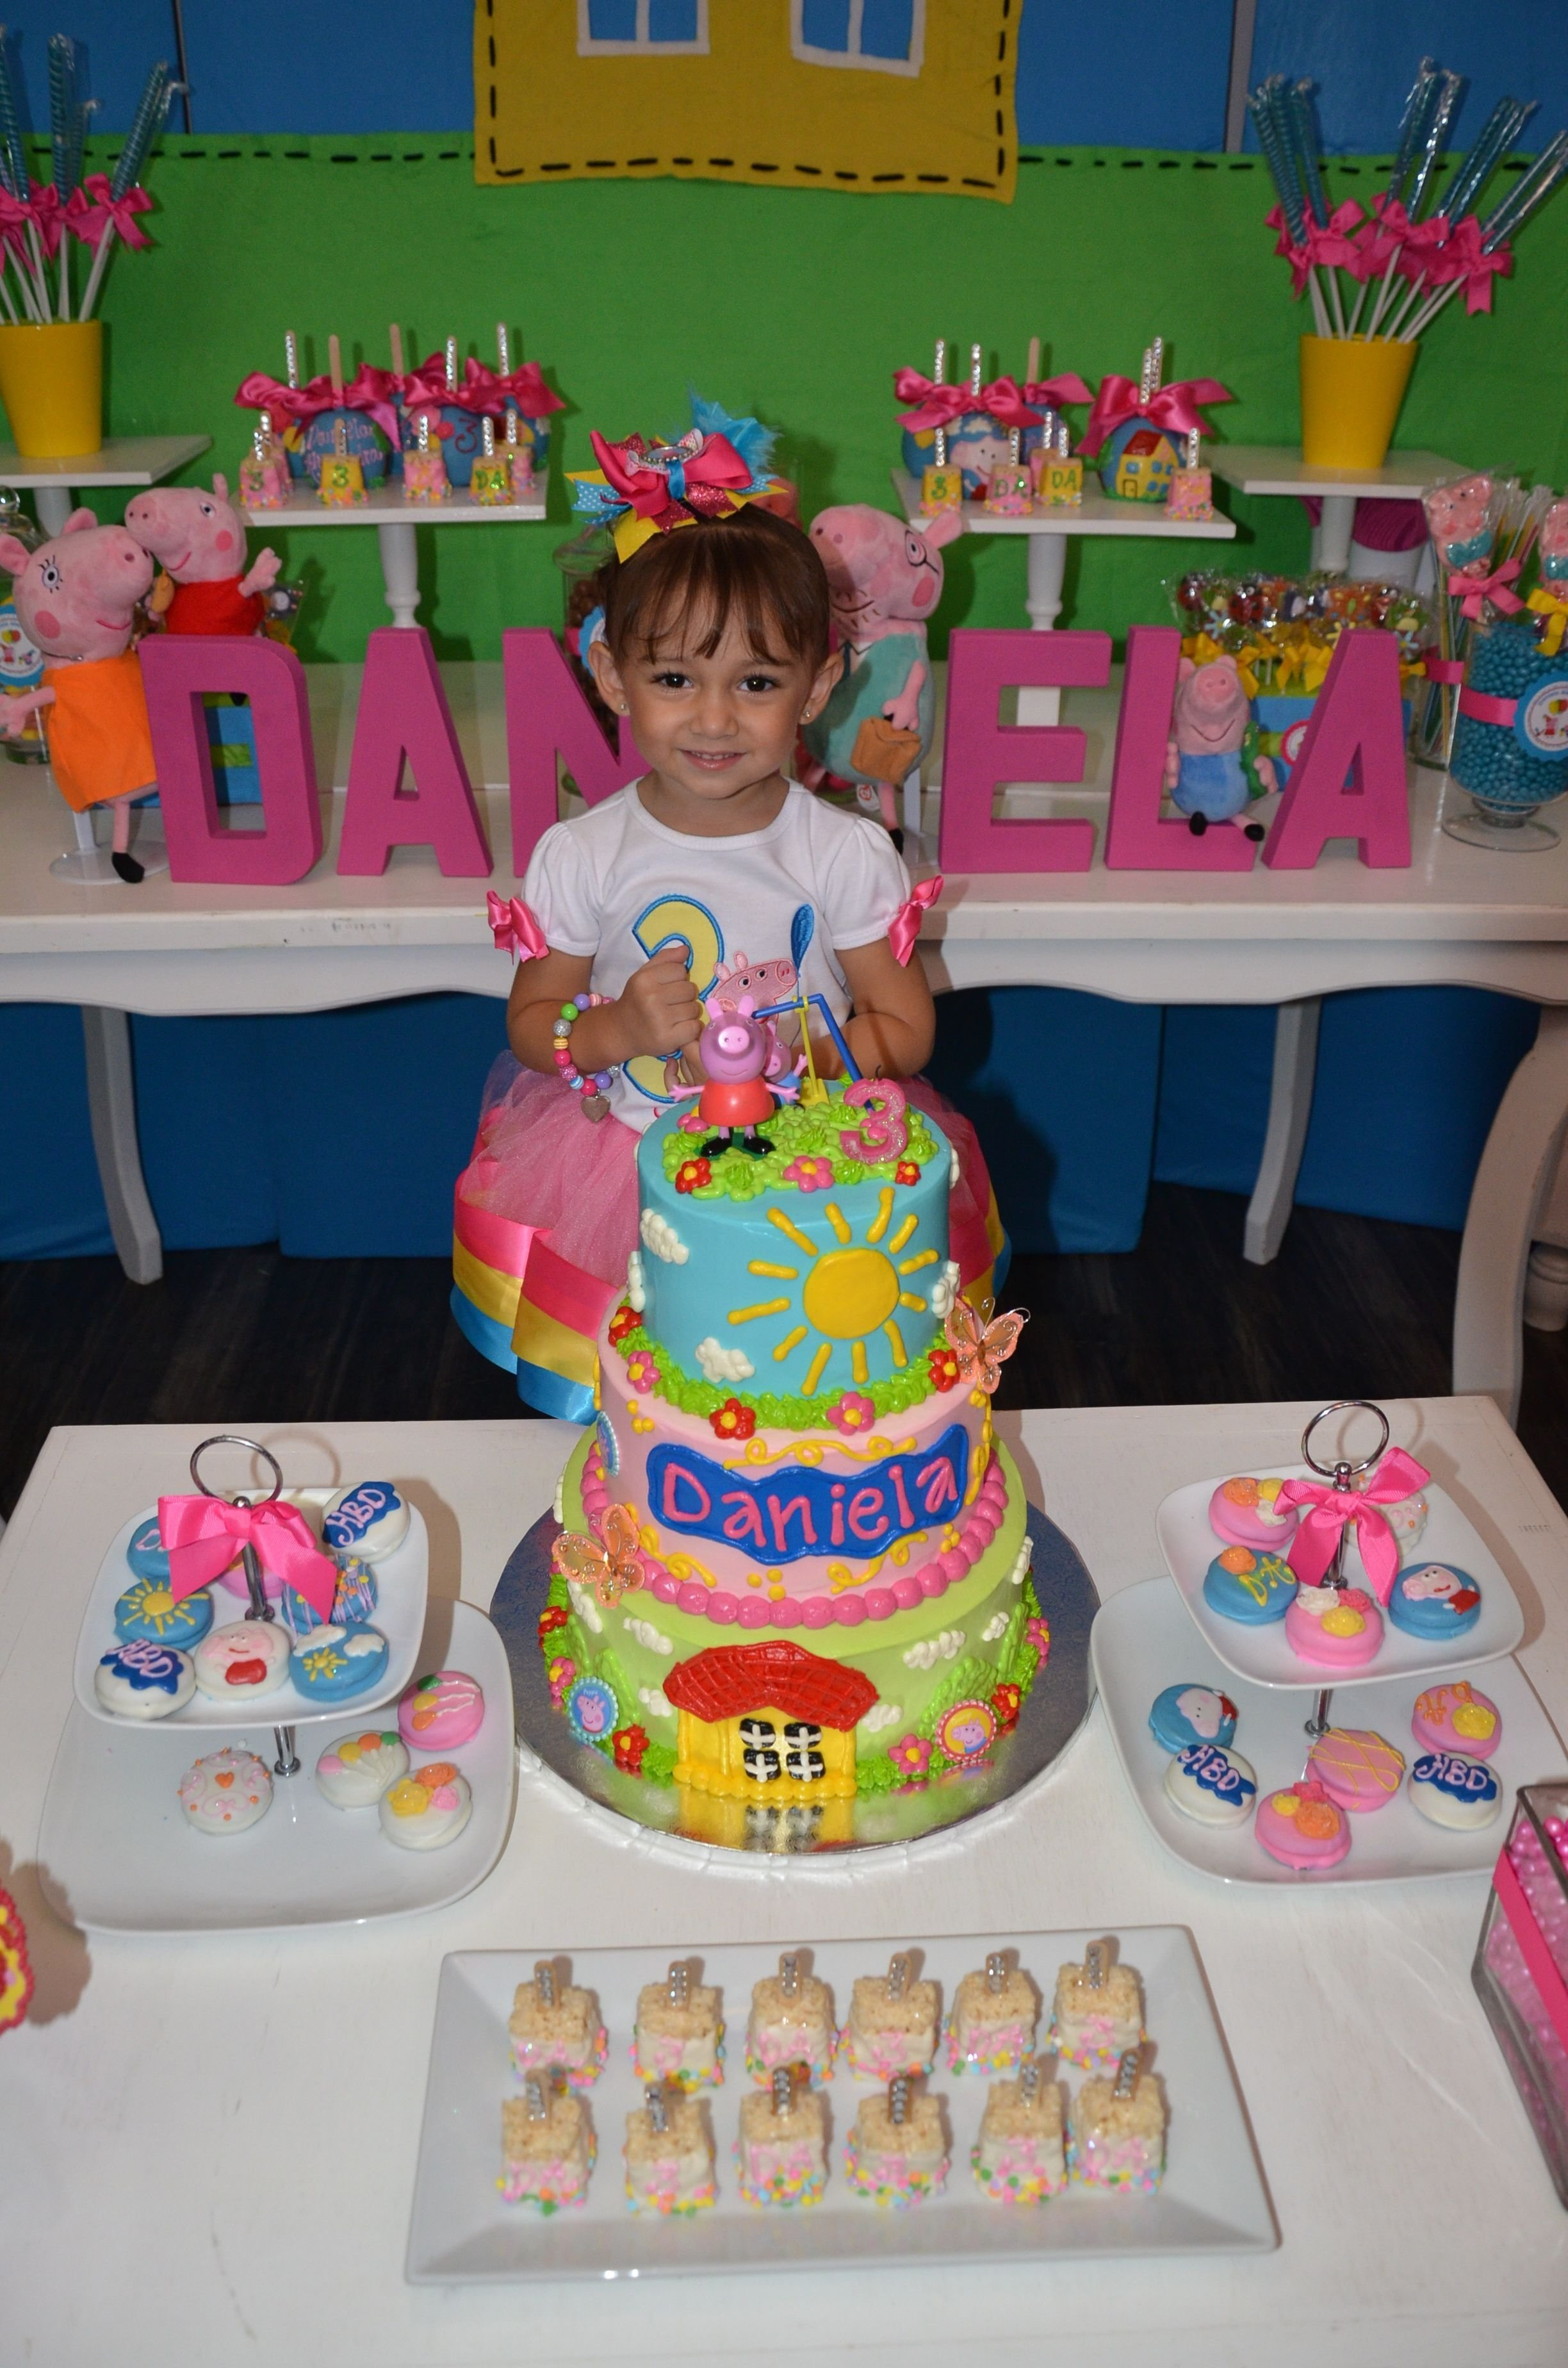 10 Unique Peppa Pig Birthday Party Ideas peppa pig birthday party dany 3 pinterest pig birthday 2021